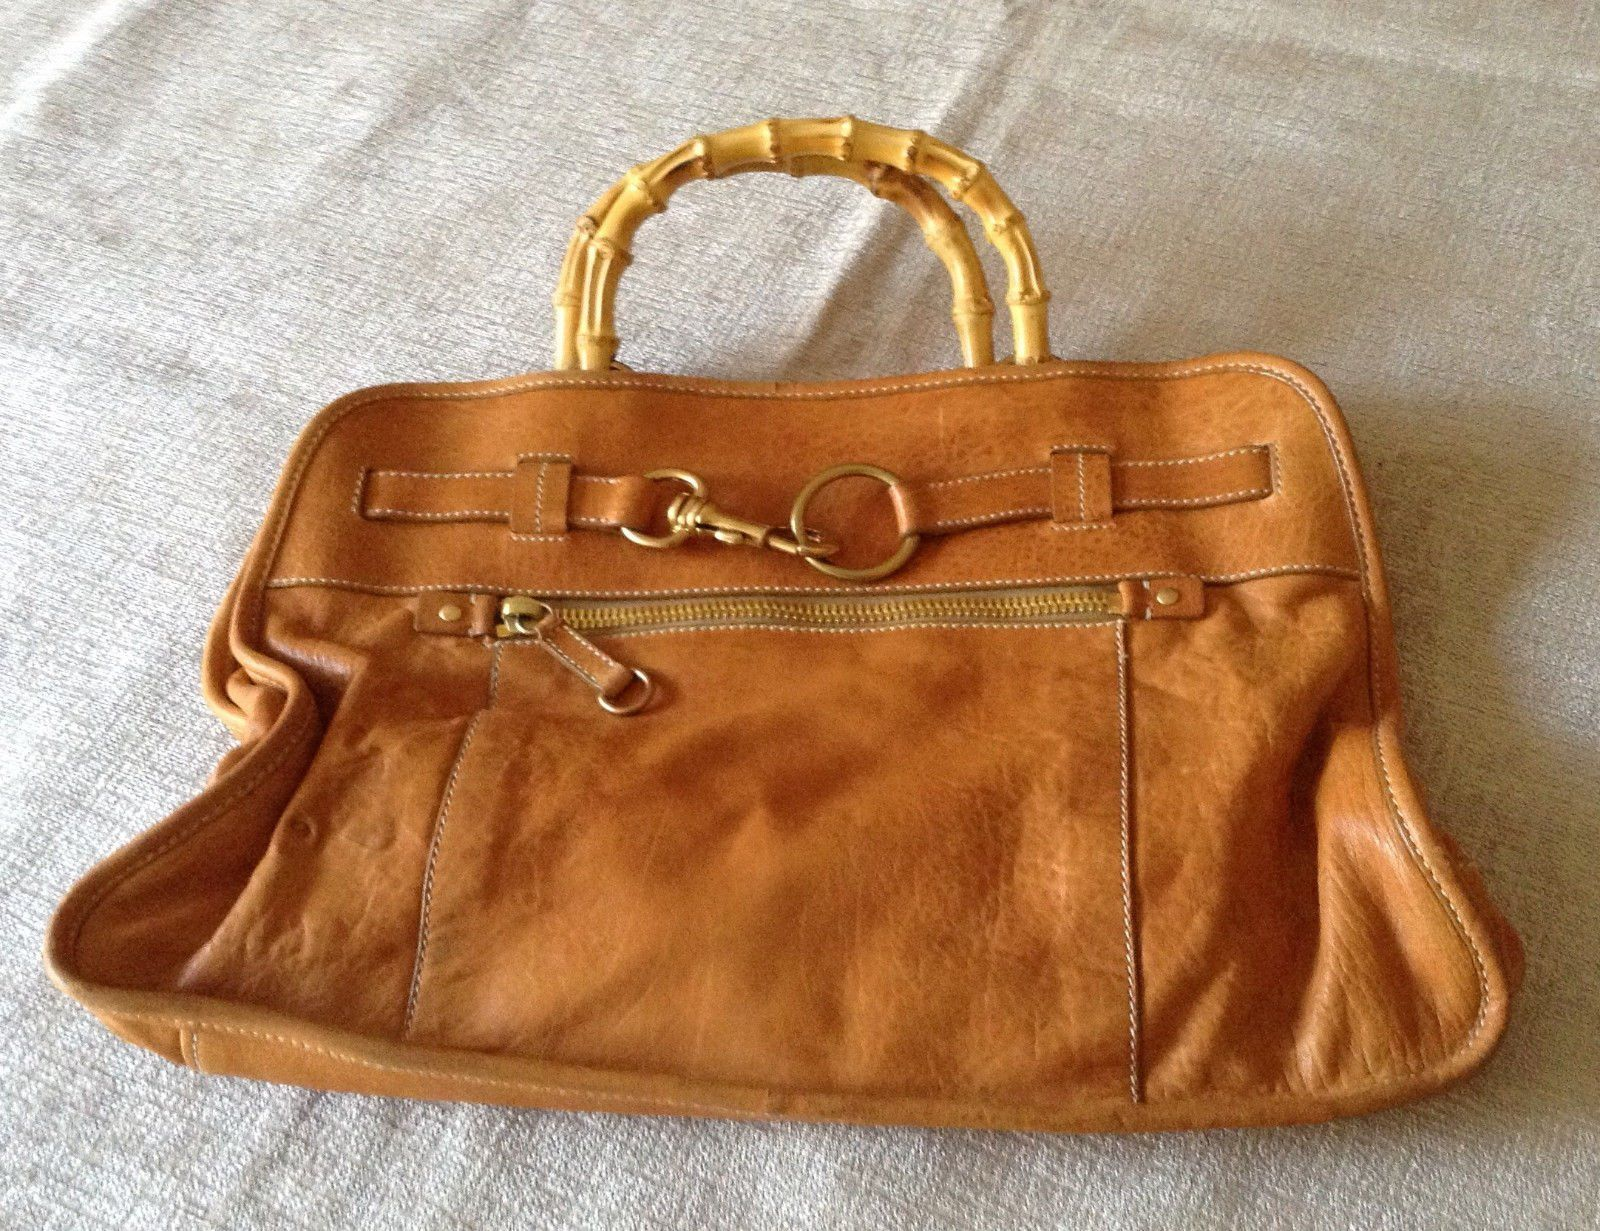 Trending Miu Handbag With Bamboo Handle S T Co